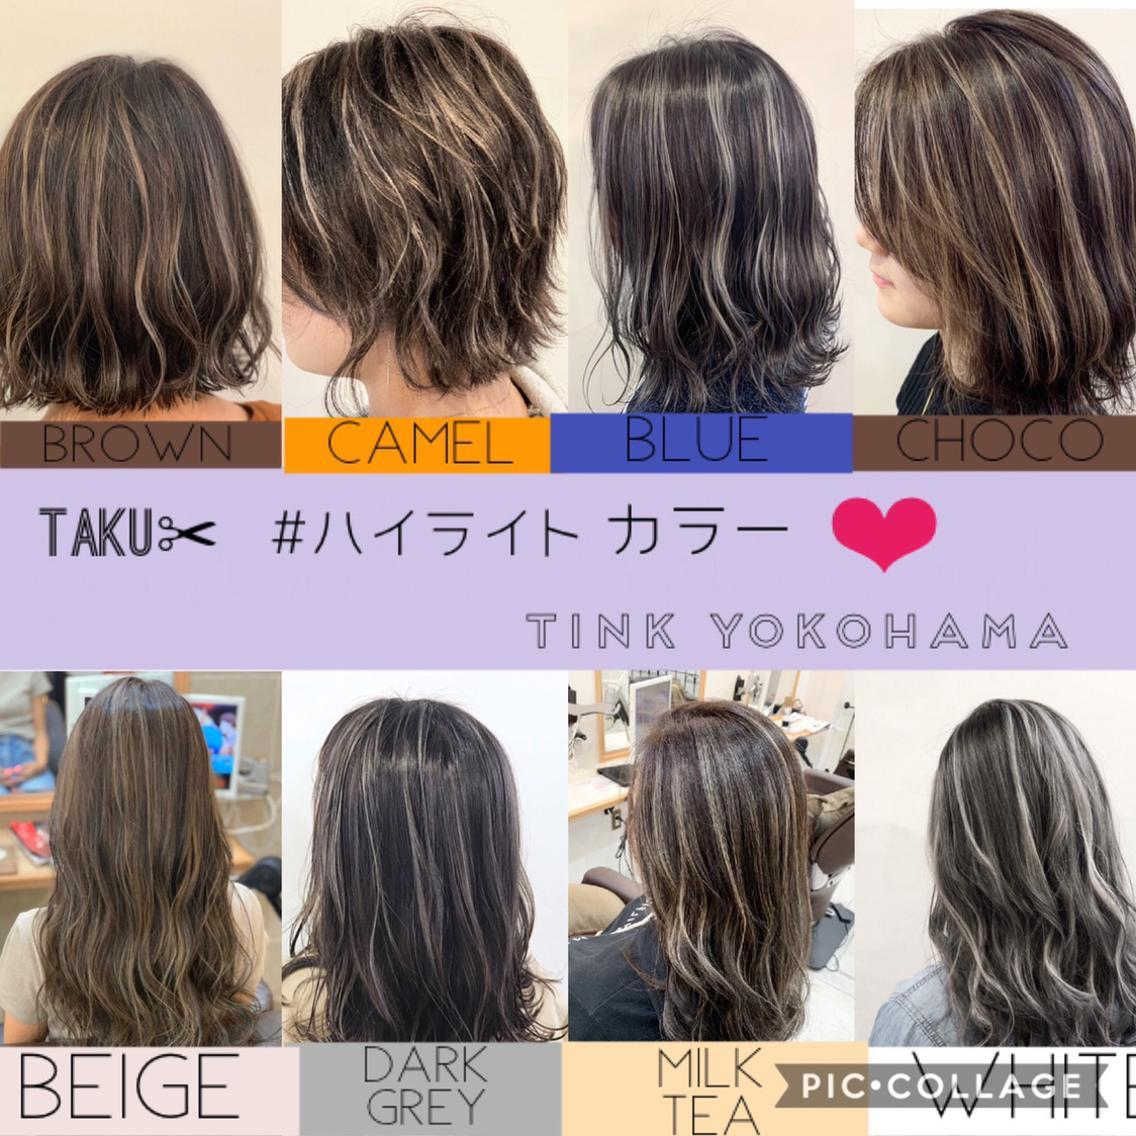 Tink横浜所属・平尾 拓也の掲載